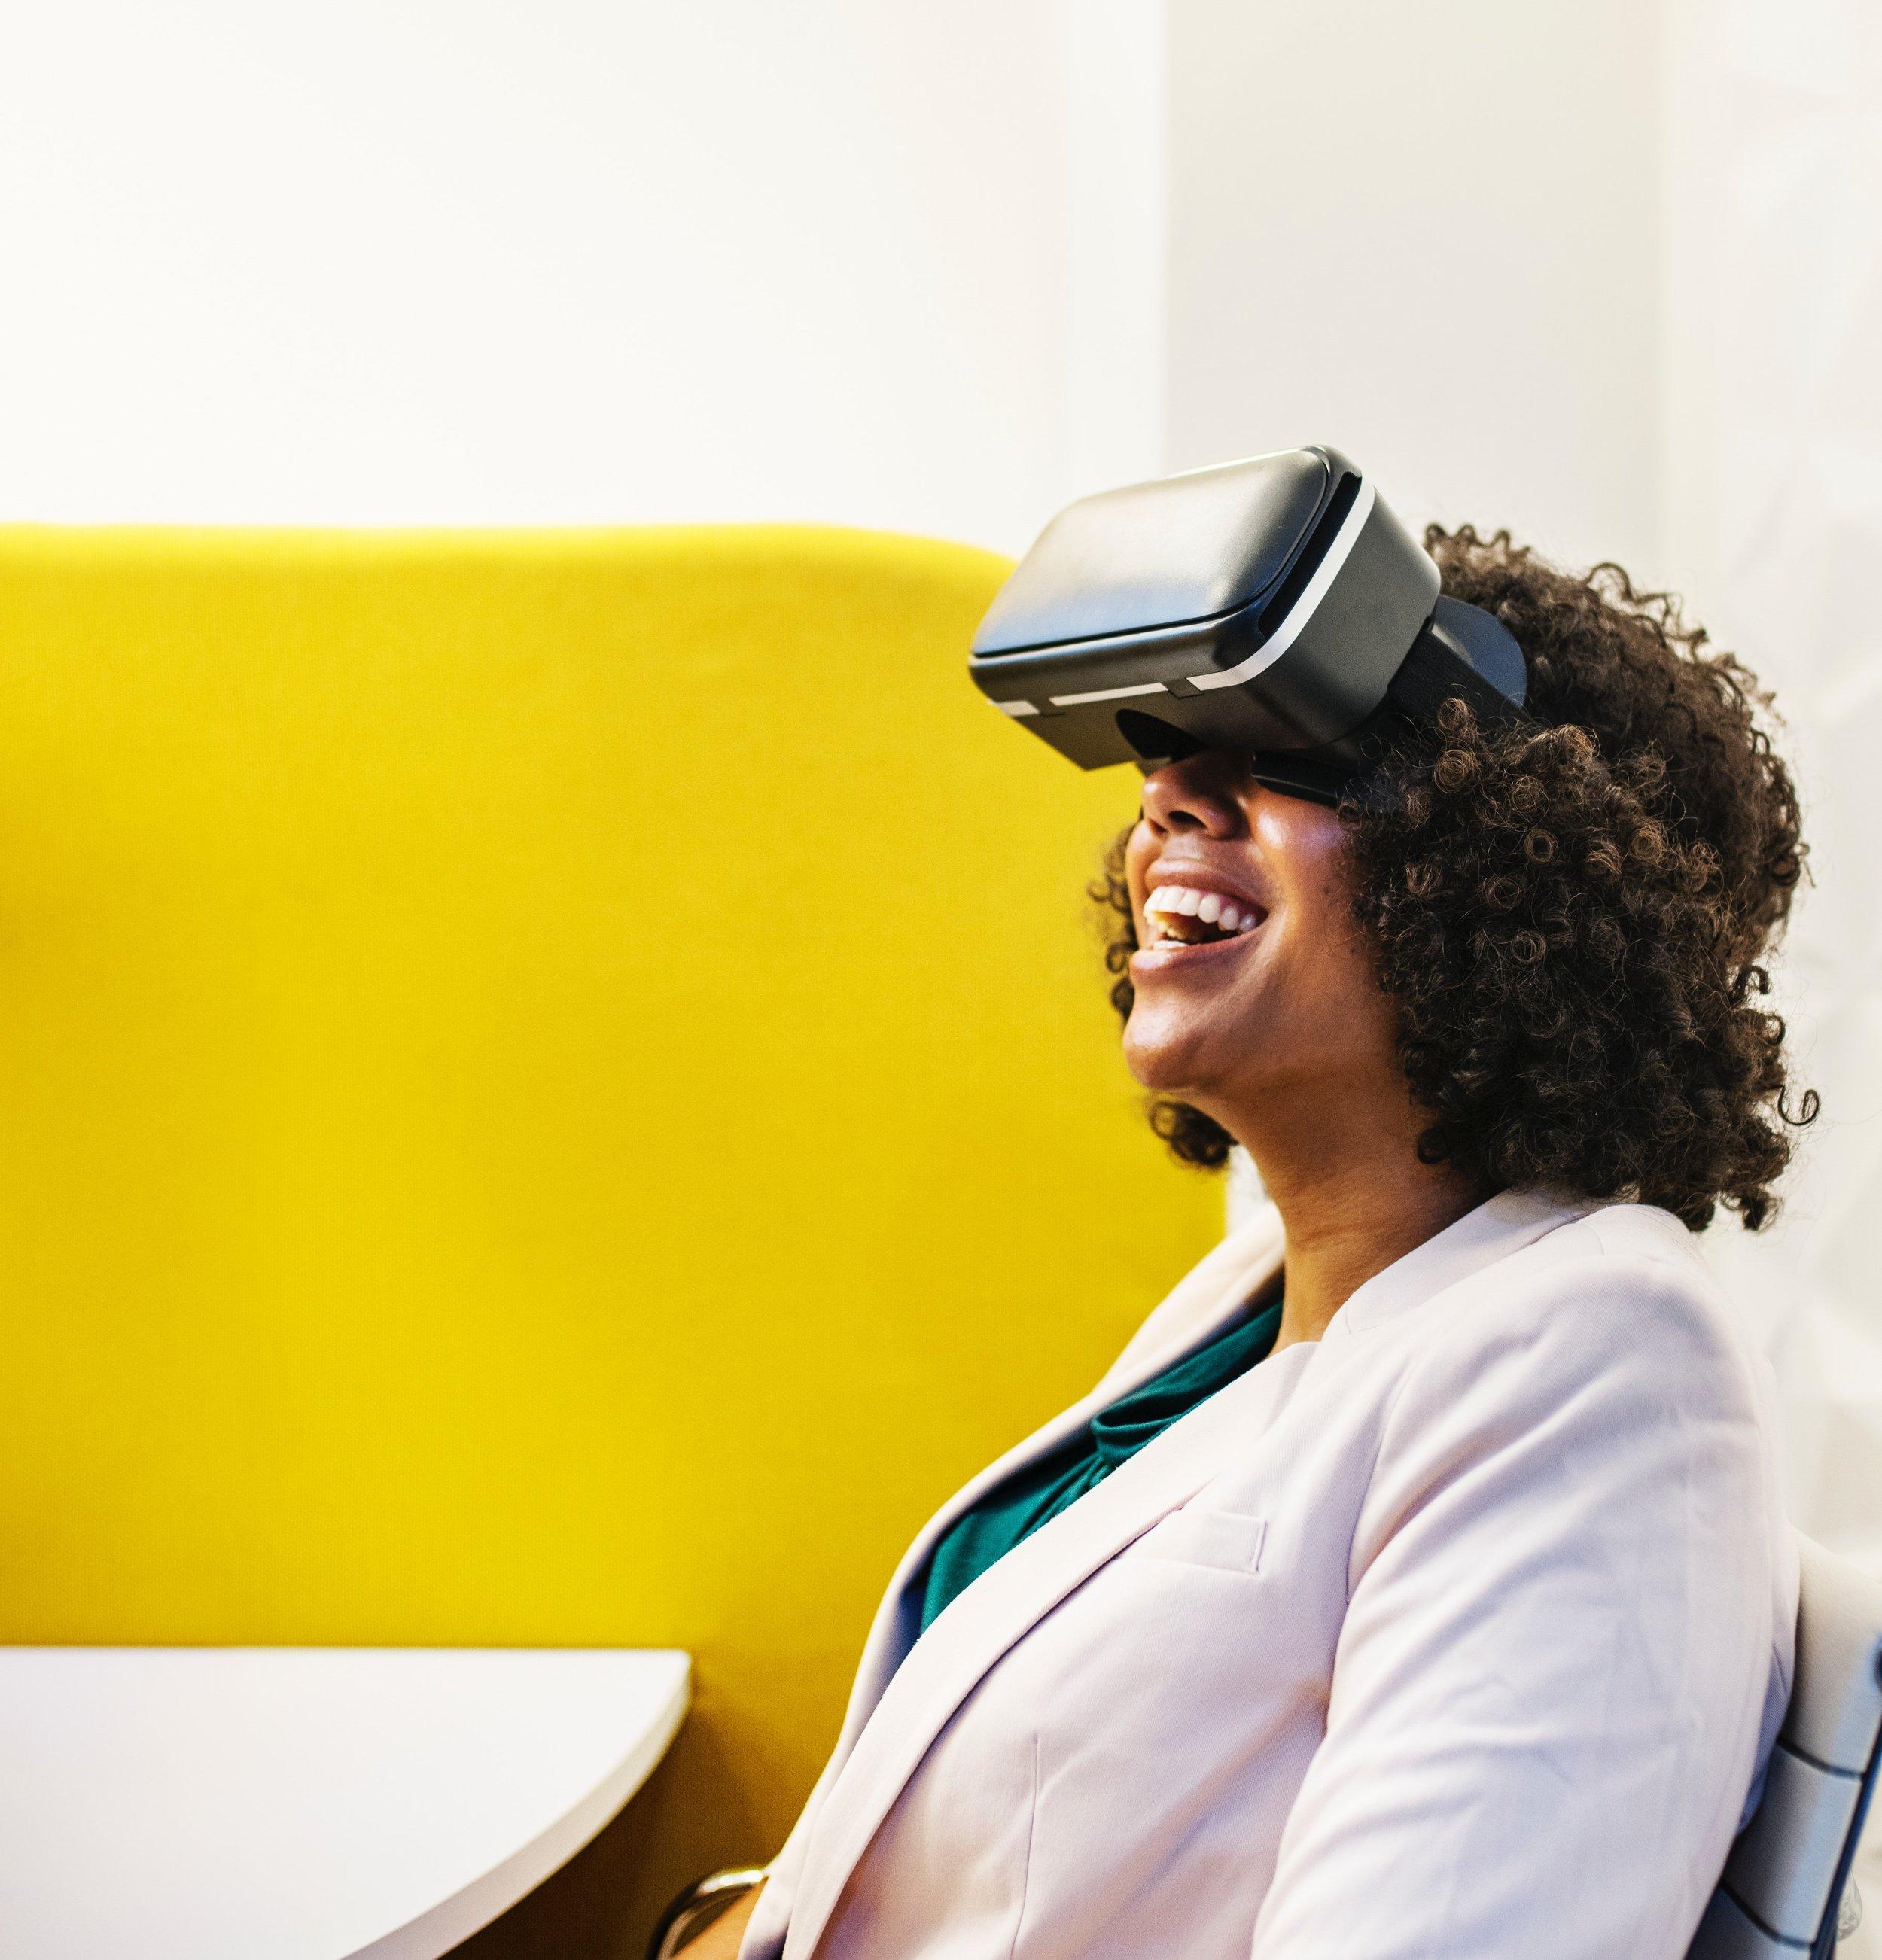 realitate virtuala arhitectura.jpg